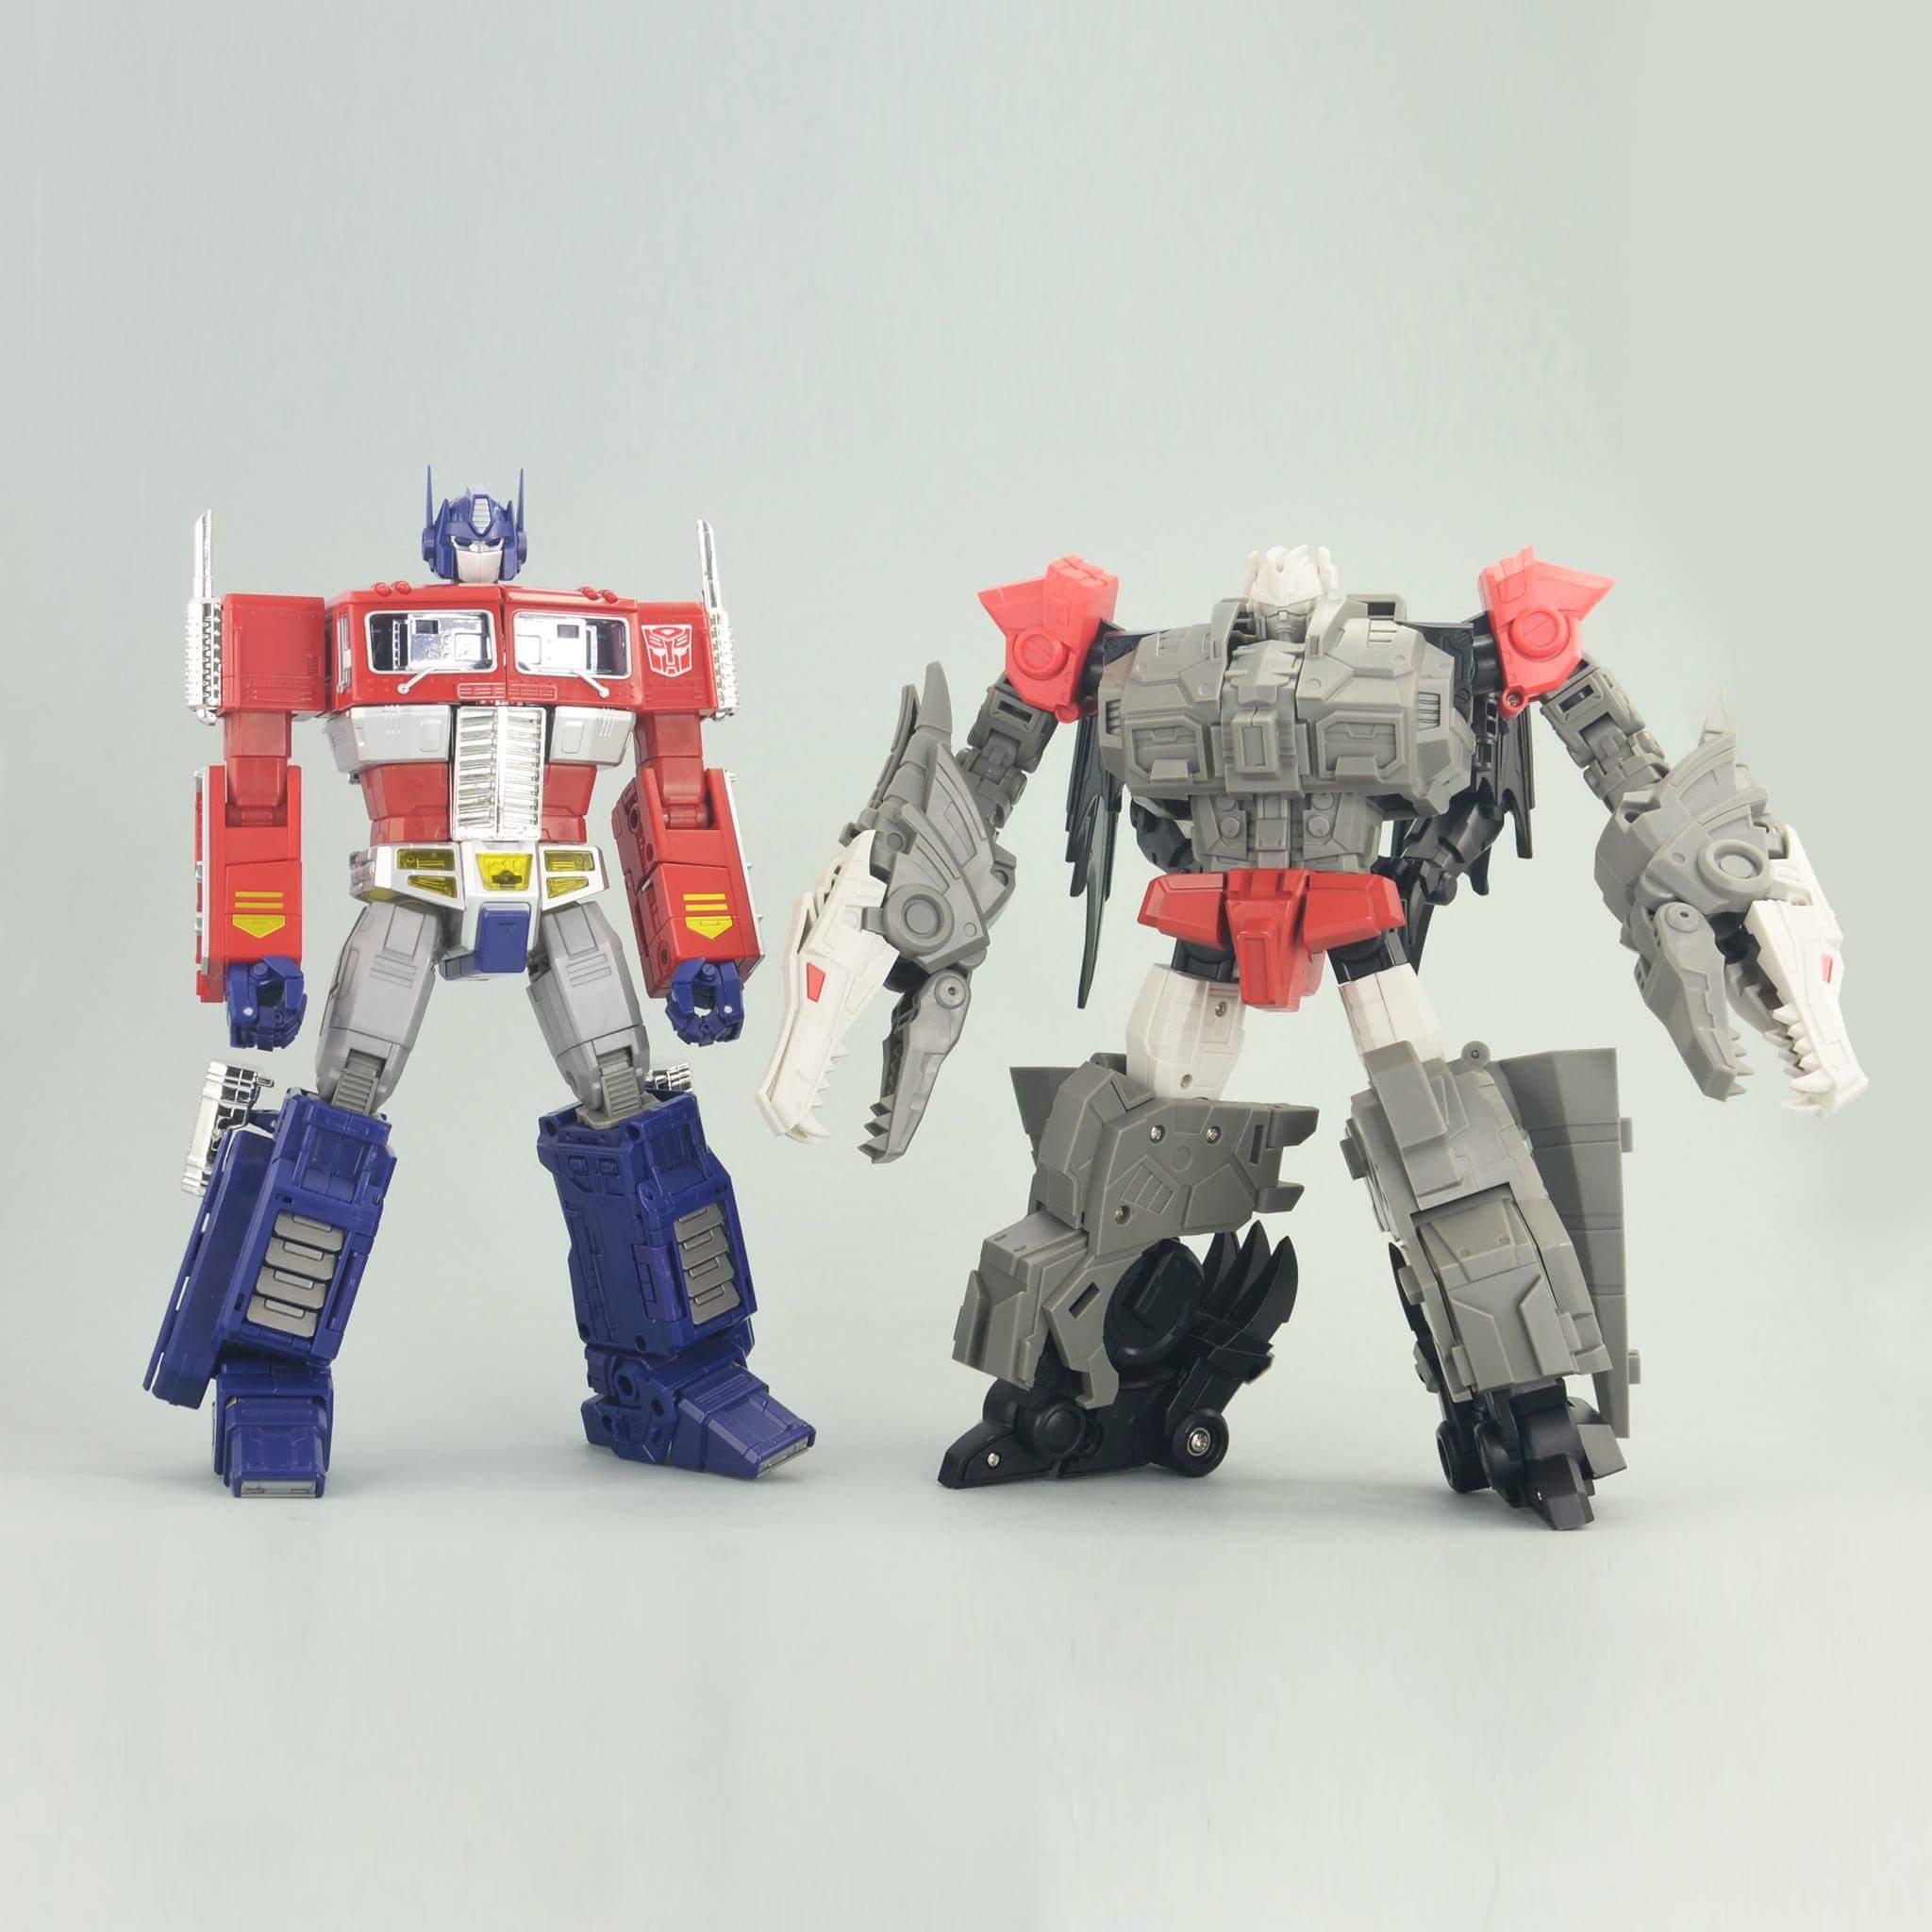 [FansHobby] Produit Tiers - Master Builder MB-02/03/05 - aka Monsterbots/Monstrebots - Page 2 CmcQsFNI